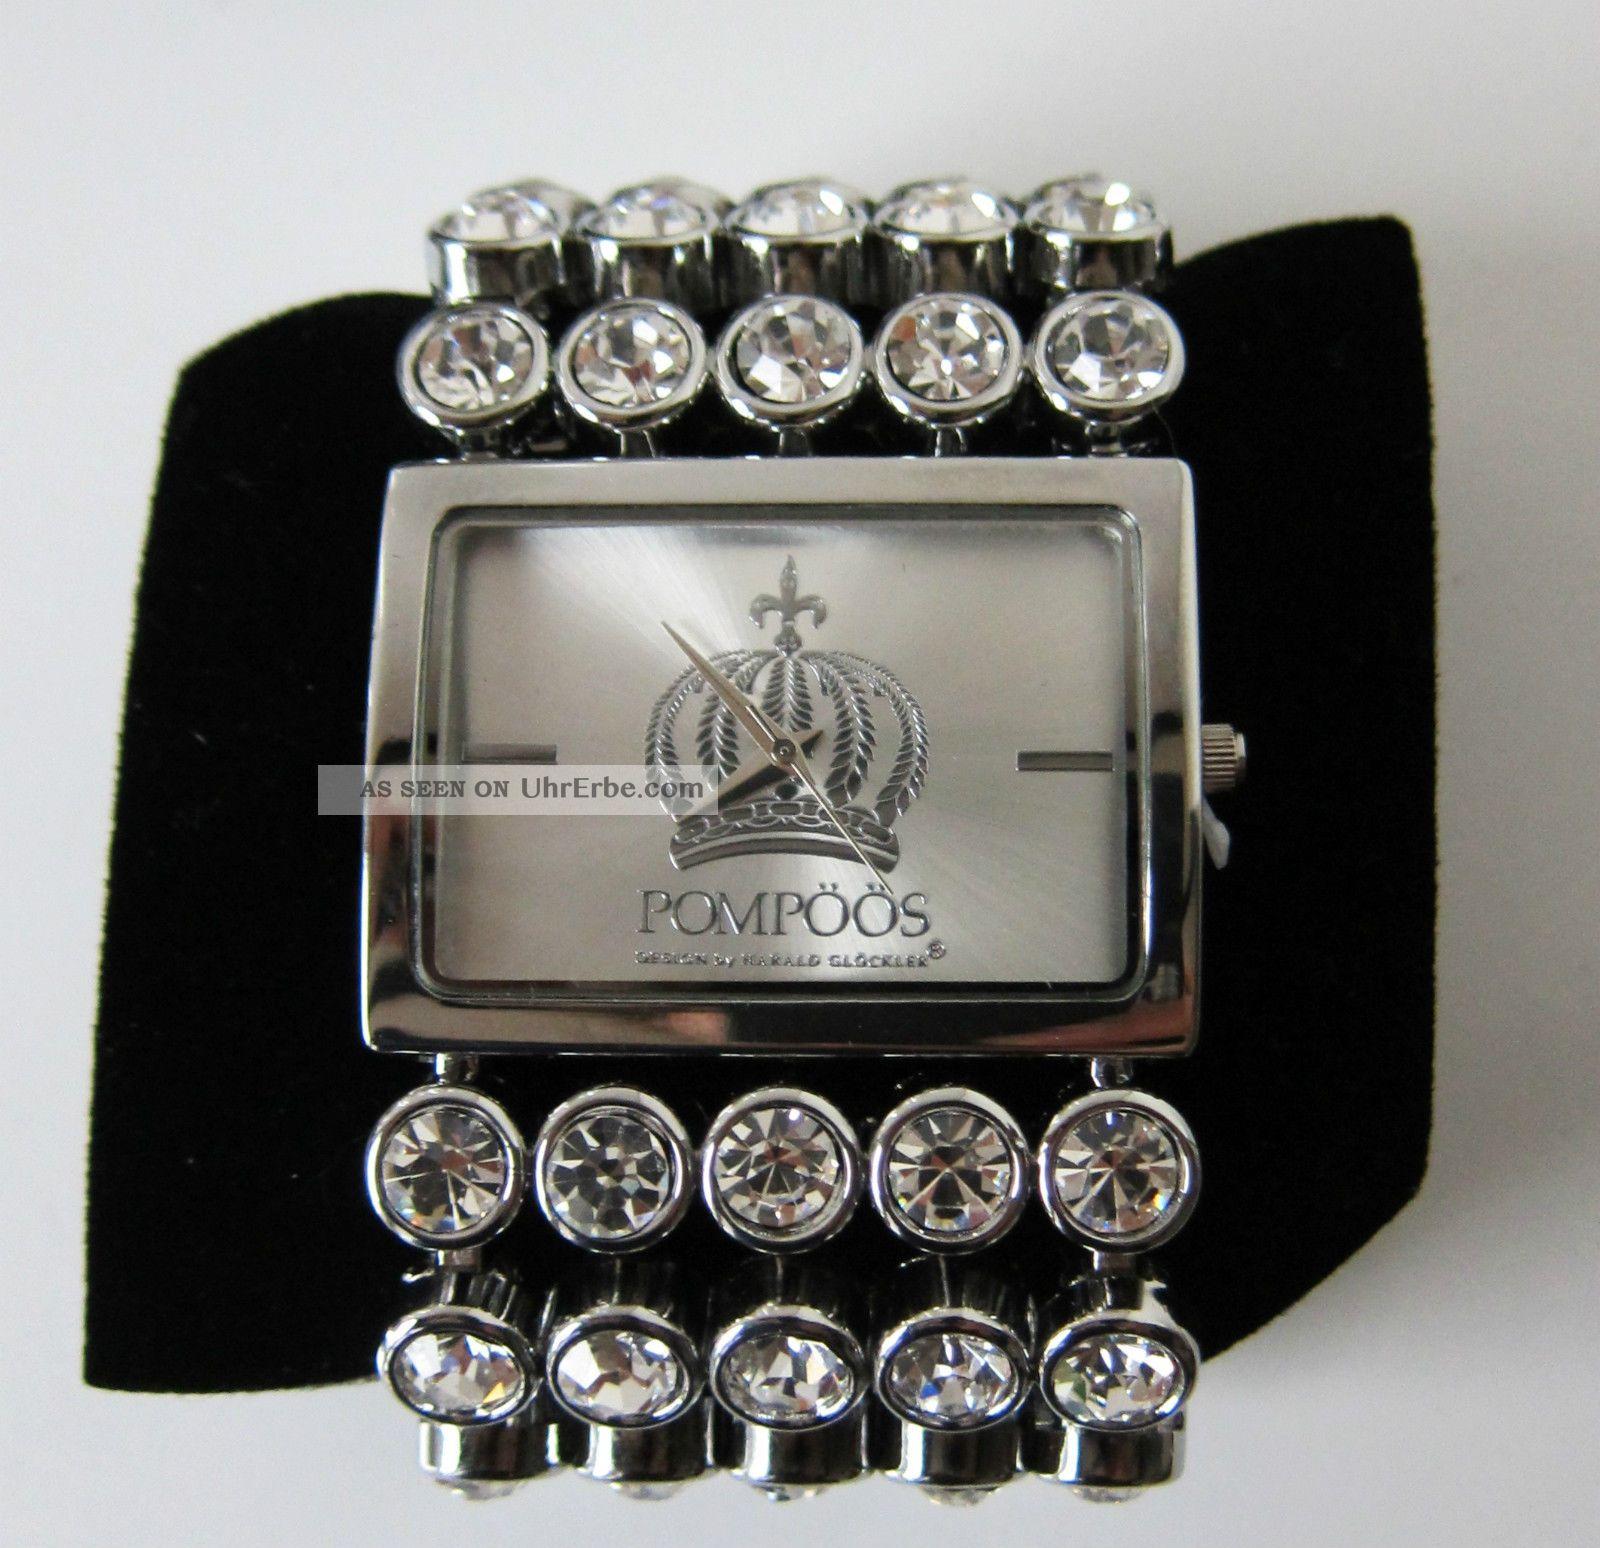 PompÖÖs Damenuhr Quarz Metallband 50 Kristalle Armbanduhren Bild